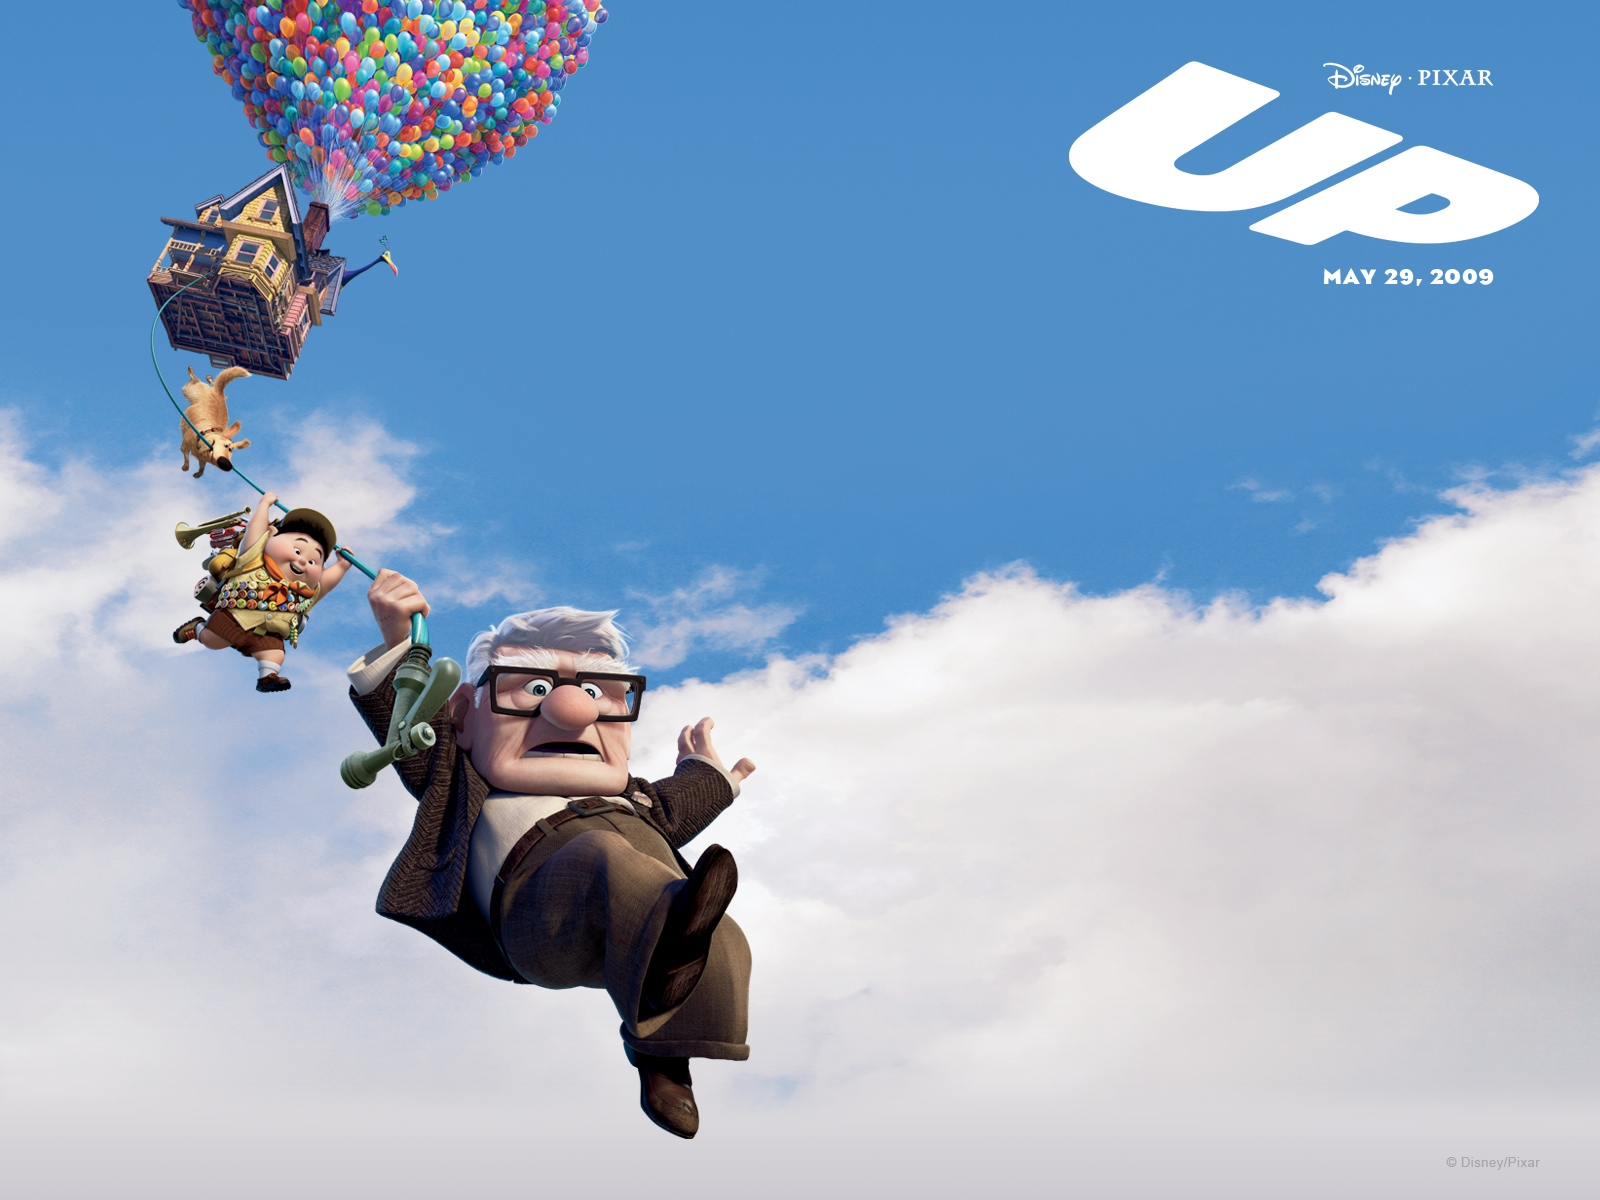 My Top 5 Best Favorite Animation Films